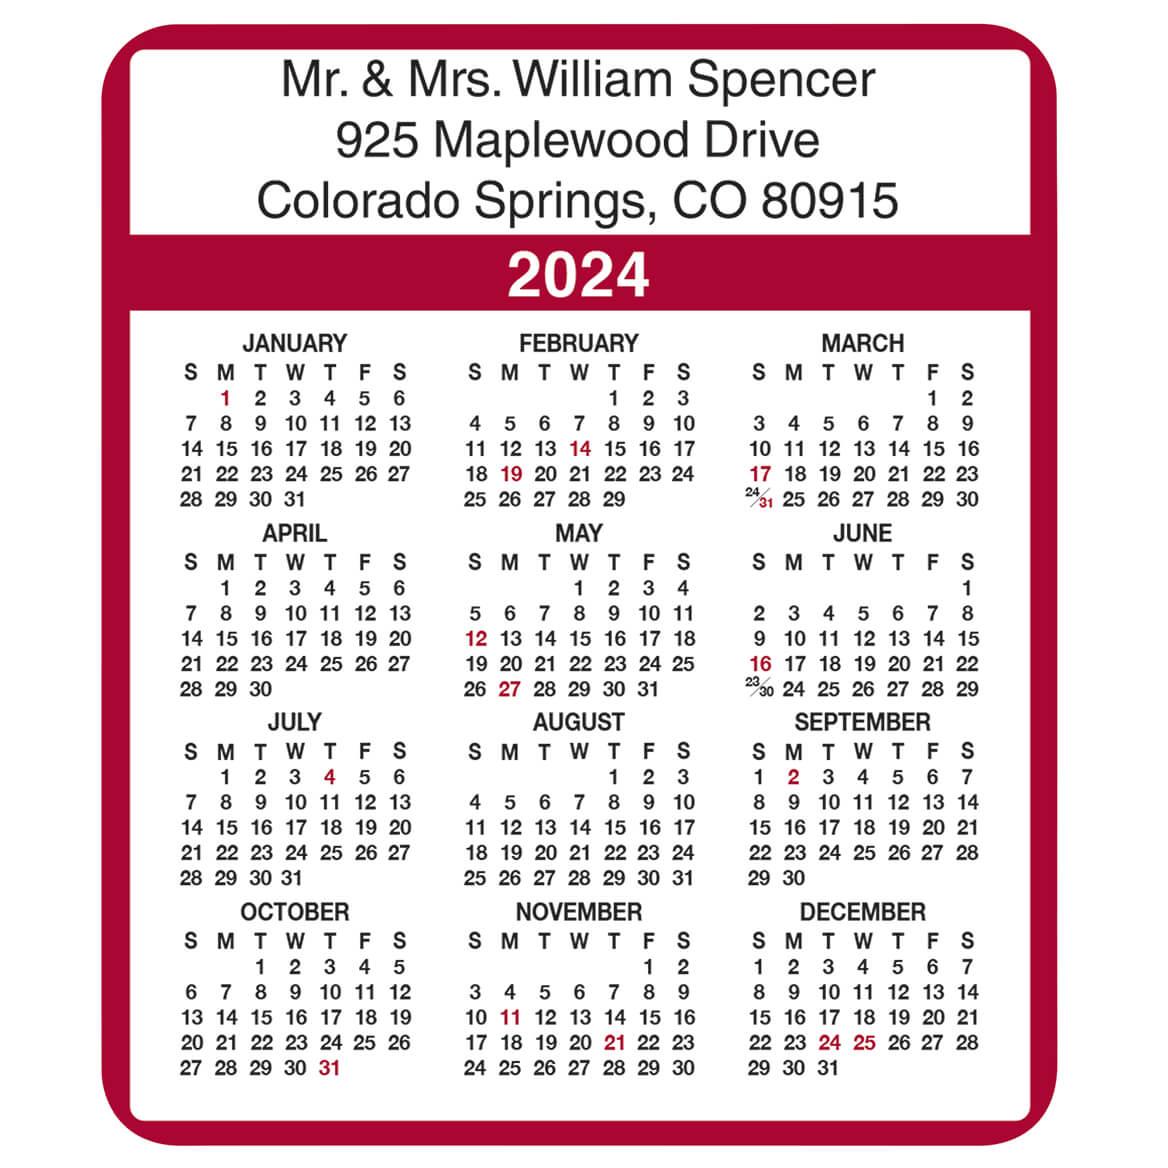 Personalized Burgundy Self-Stick Calendars, Set of 100-305554